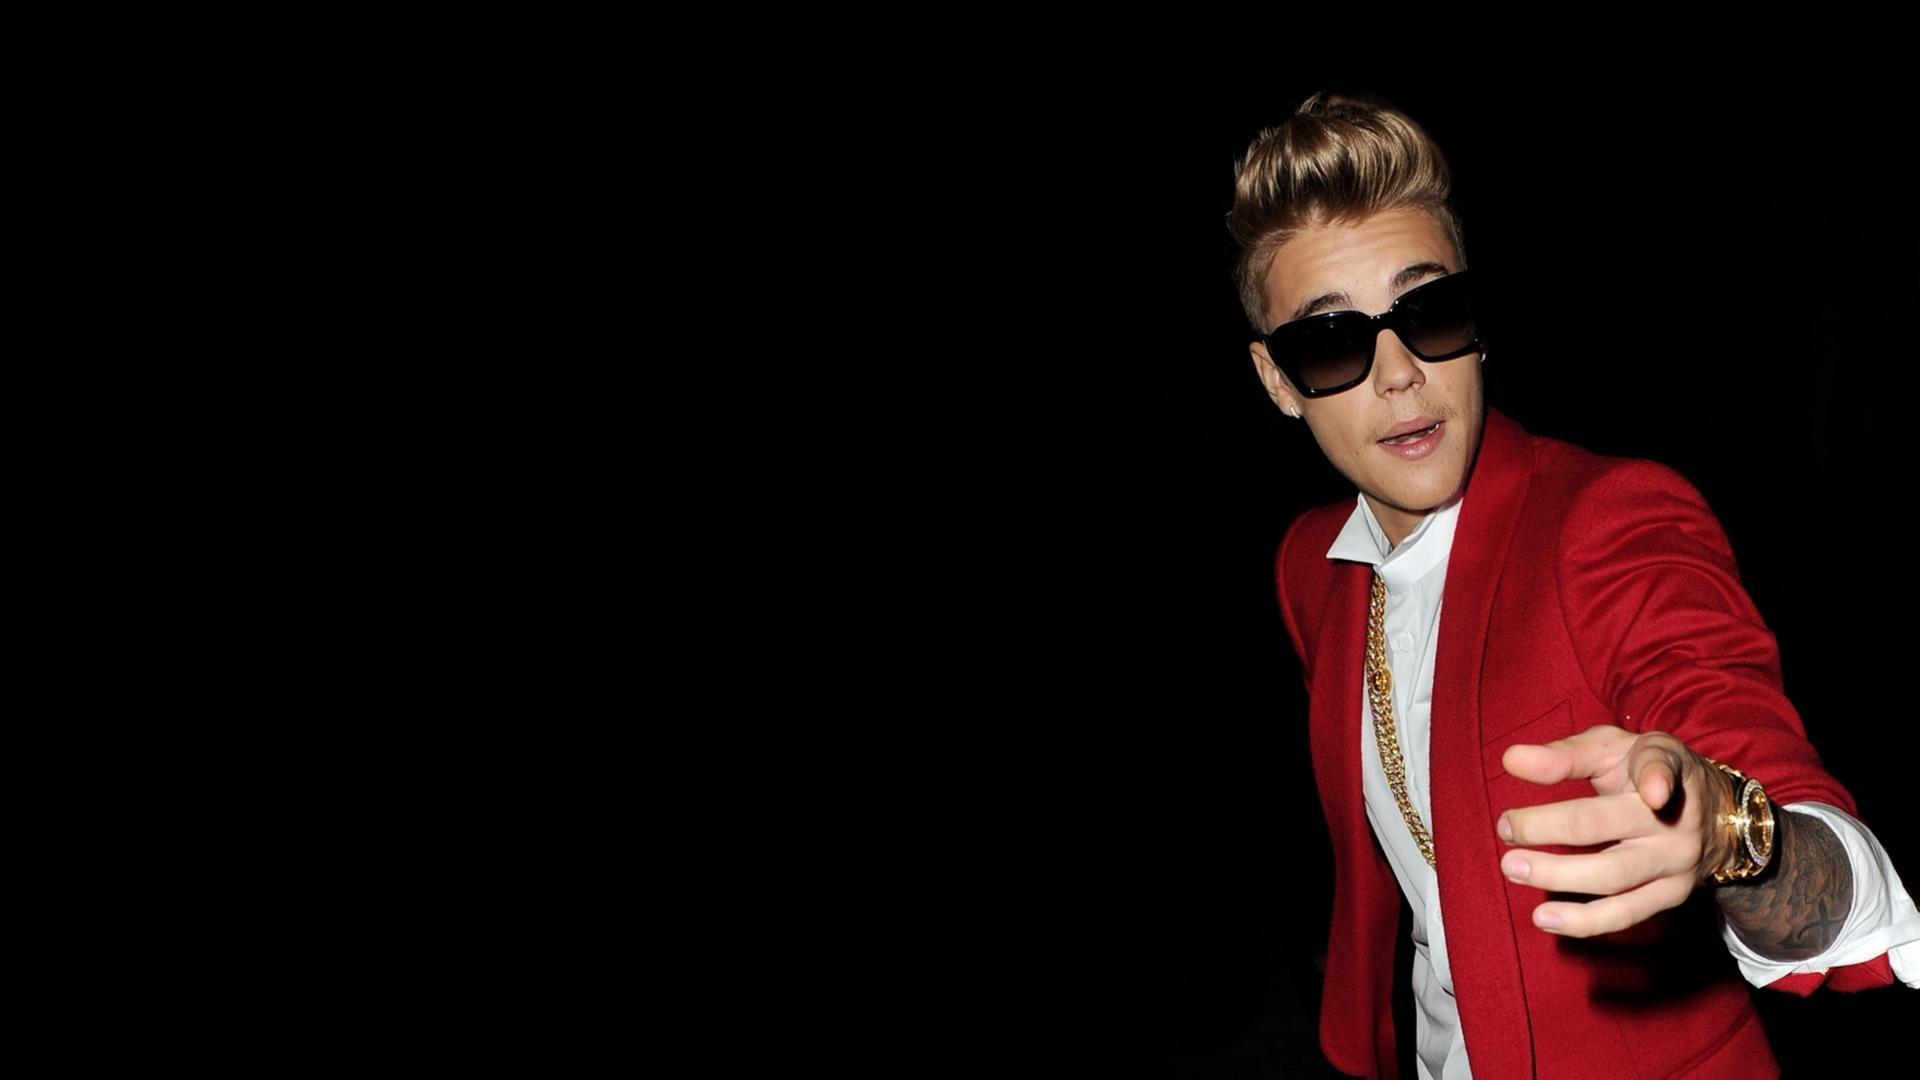 Hd wallpaper justin bieber - Download Justin Bieber Wallpaper 48518